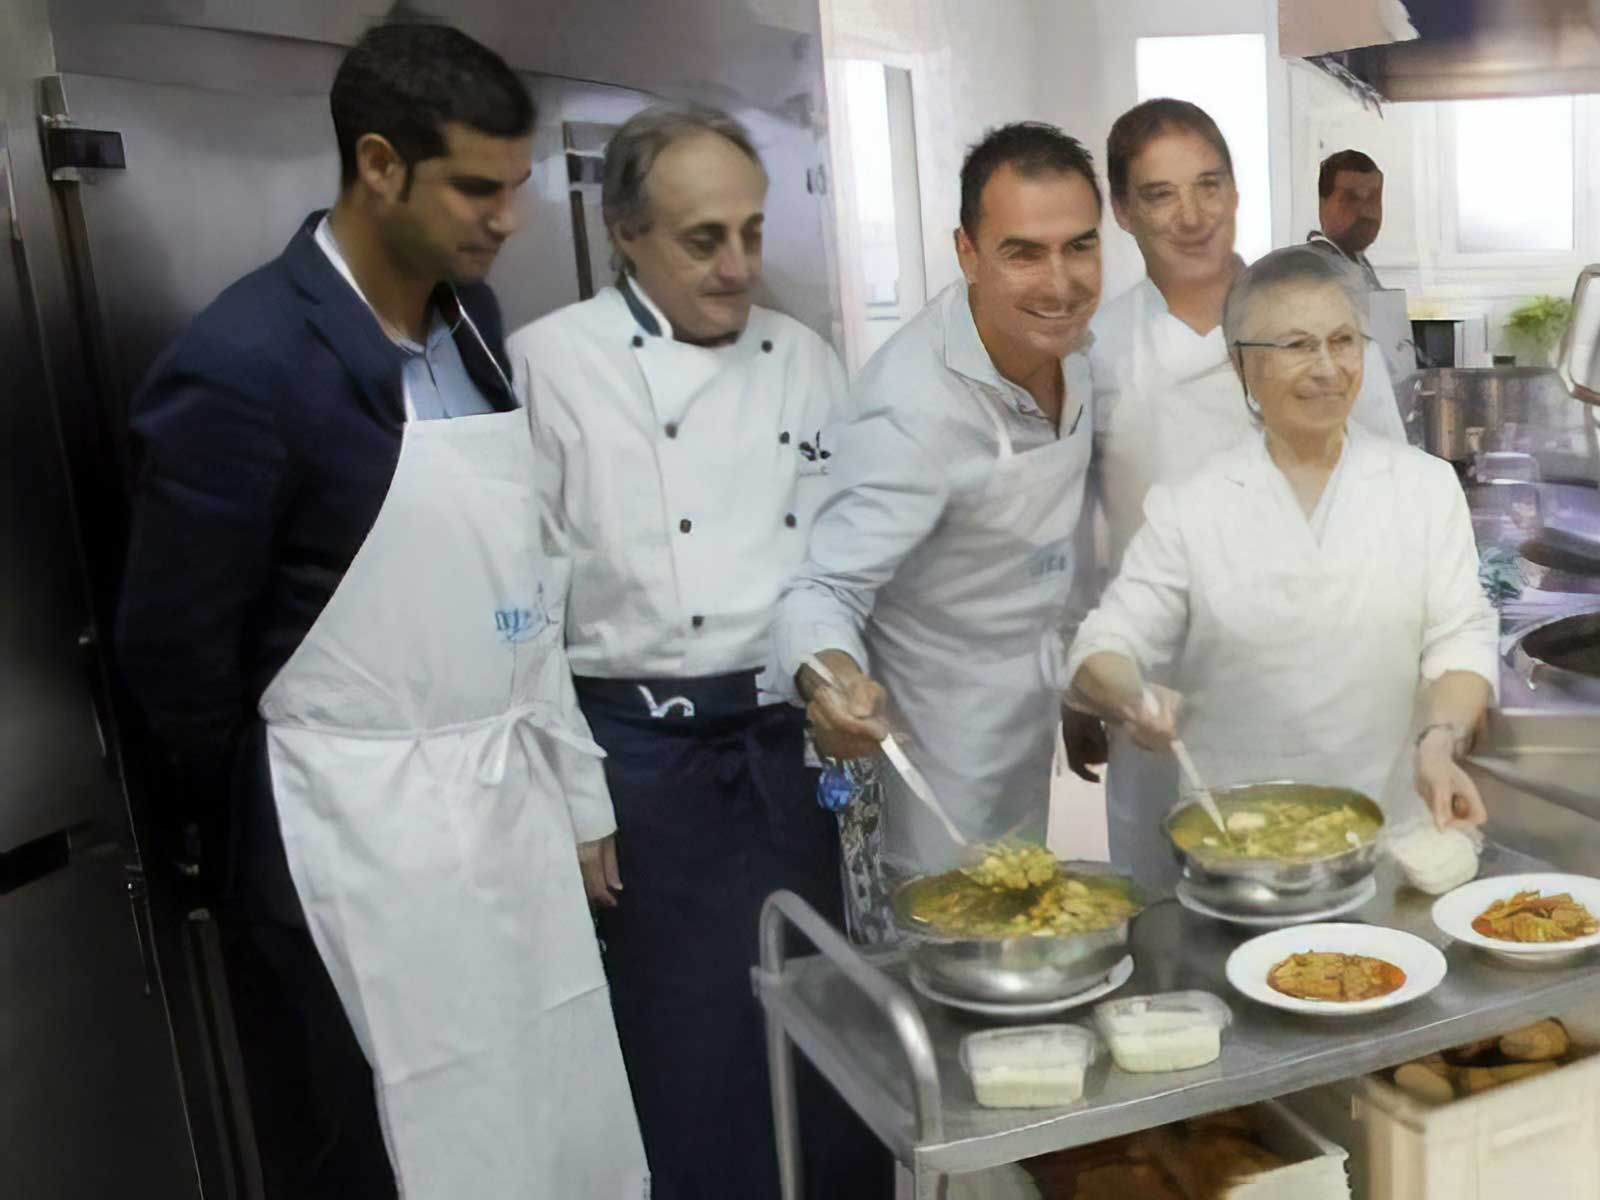 la-cofradia-del-desarme-con-la-cocina-economica